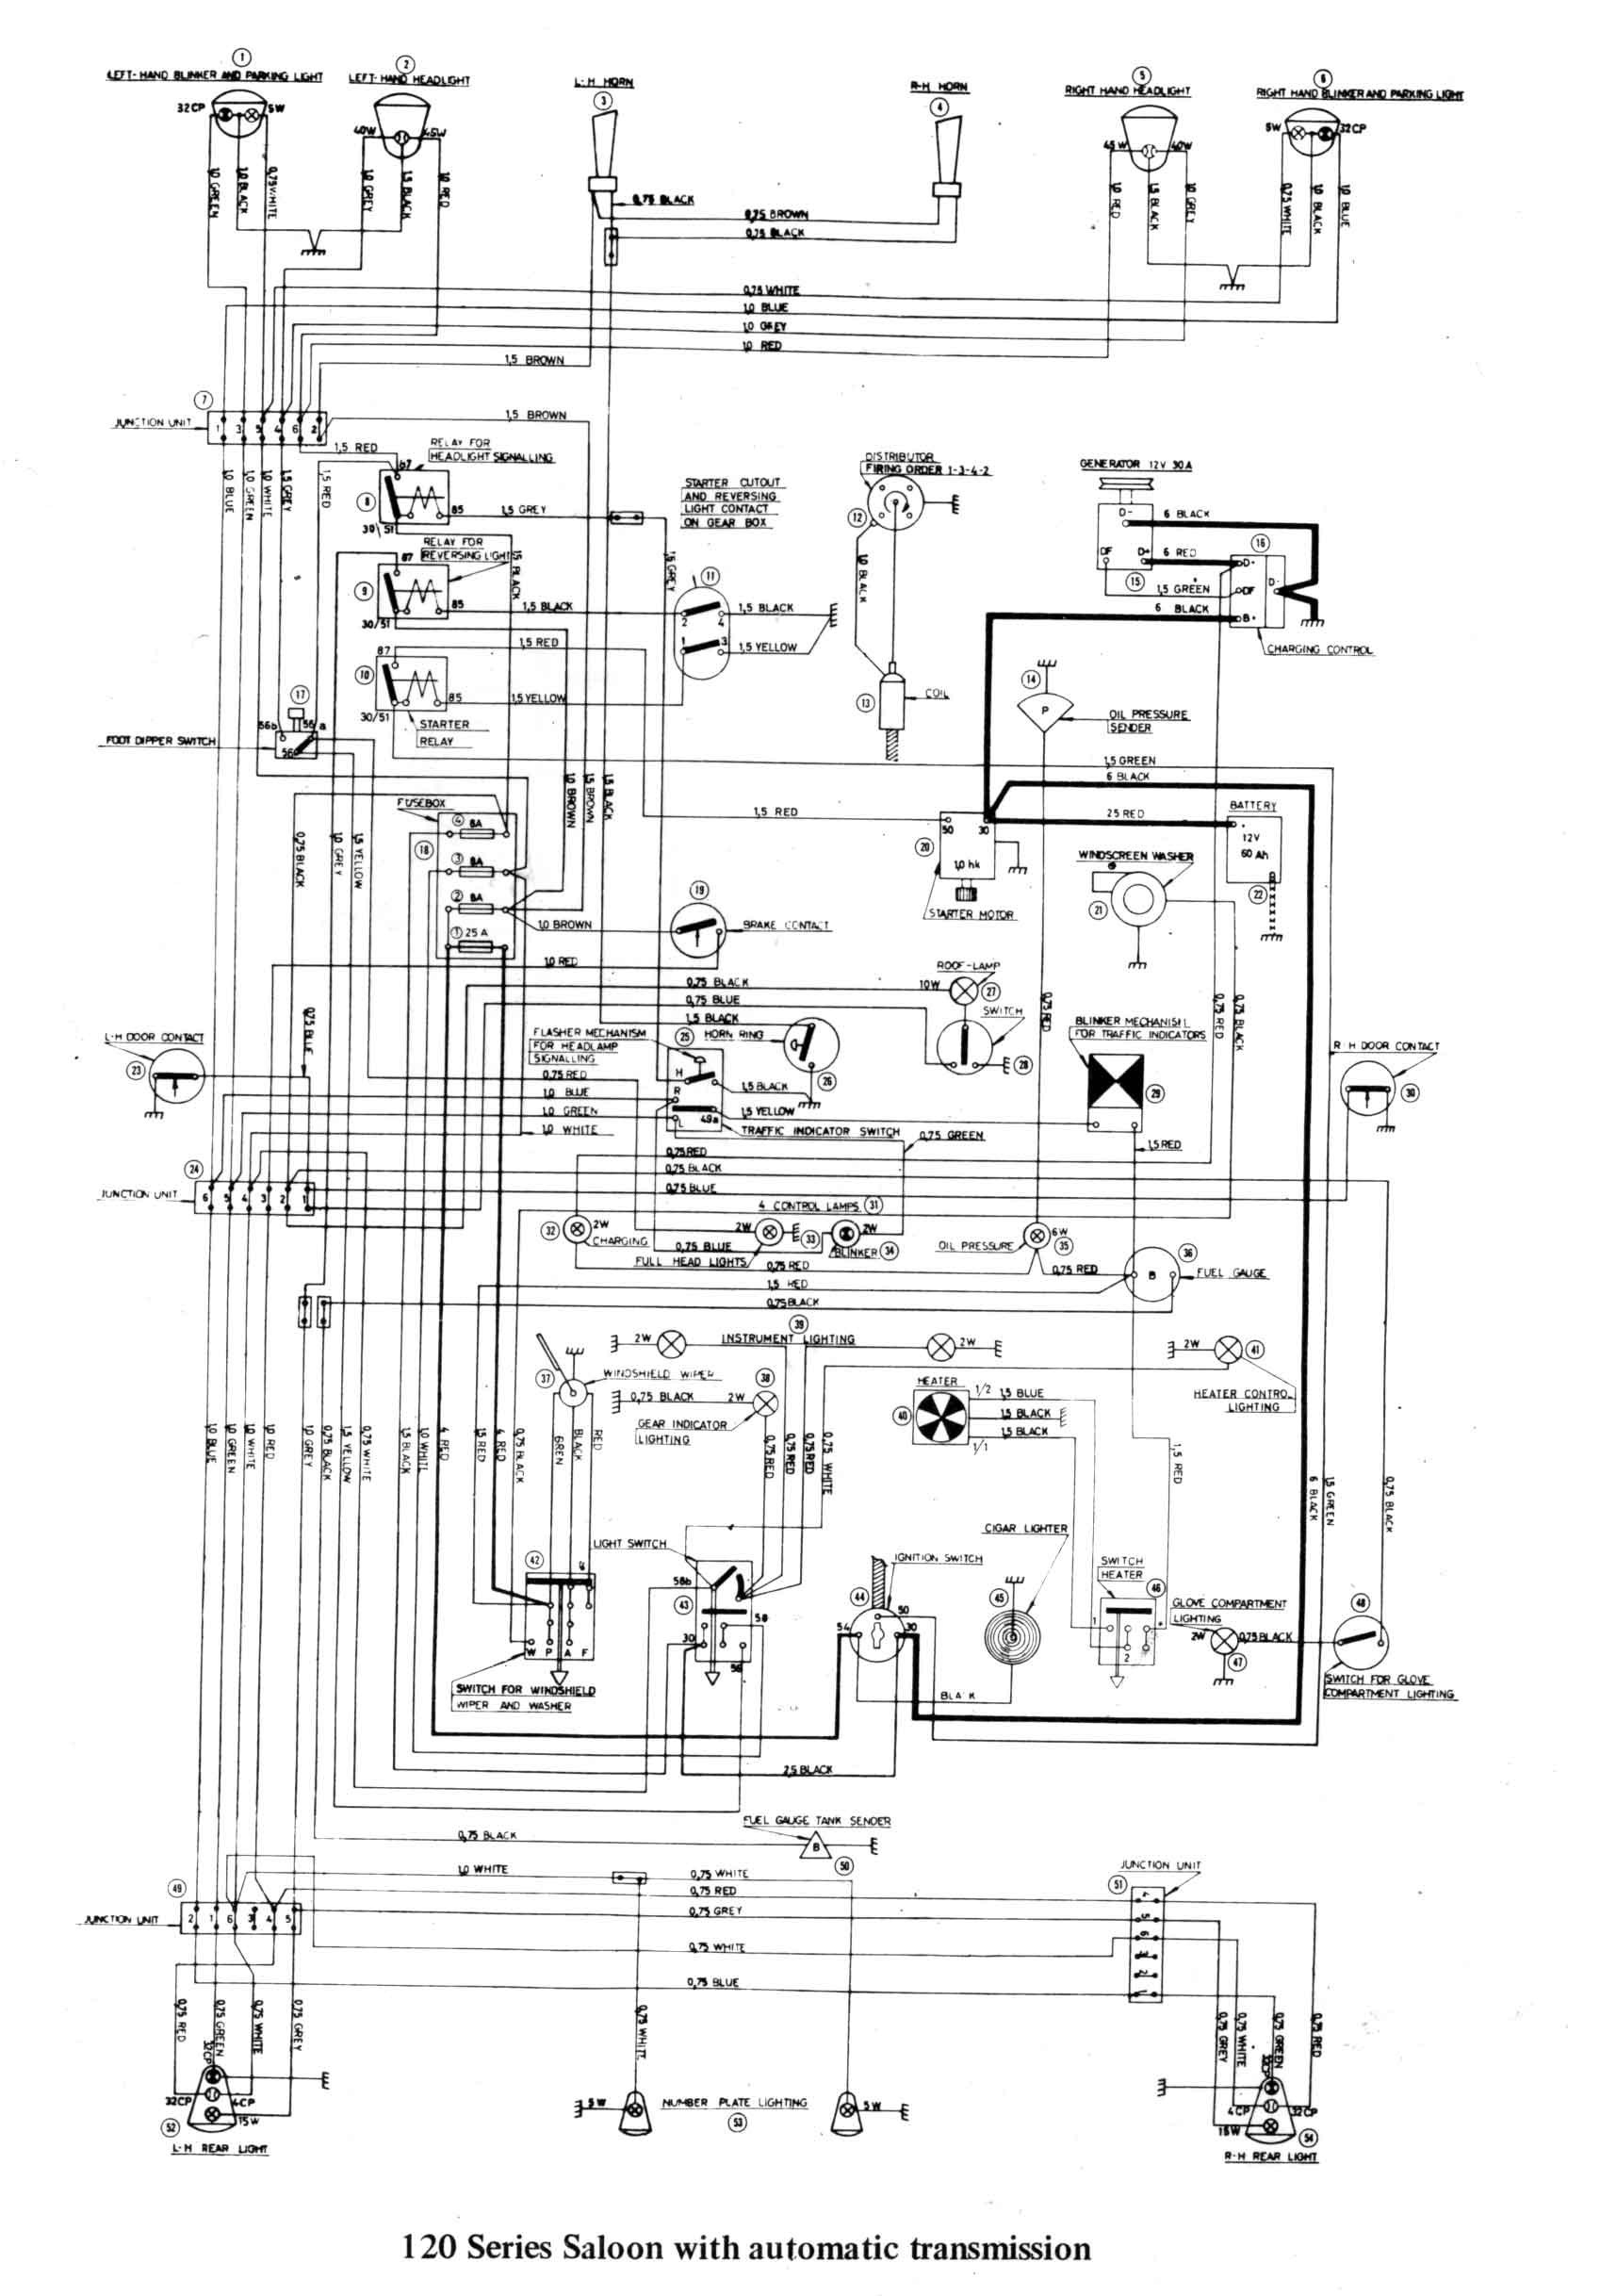 Volvo Semi Truck Fuses Diagram Start Building A Wiring Fuse Box For 2008 C30 Tractor Trusted Rh Detoxicrecenze Com 2003 S60